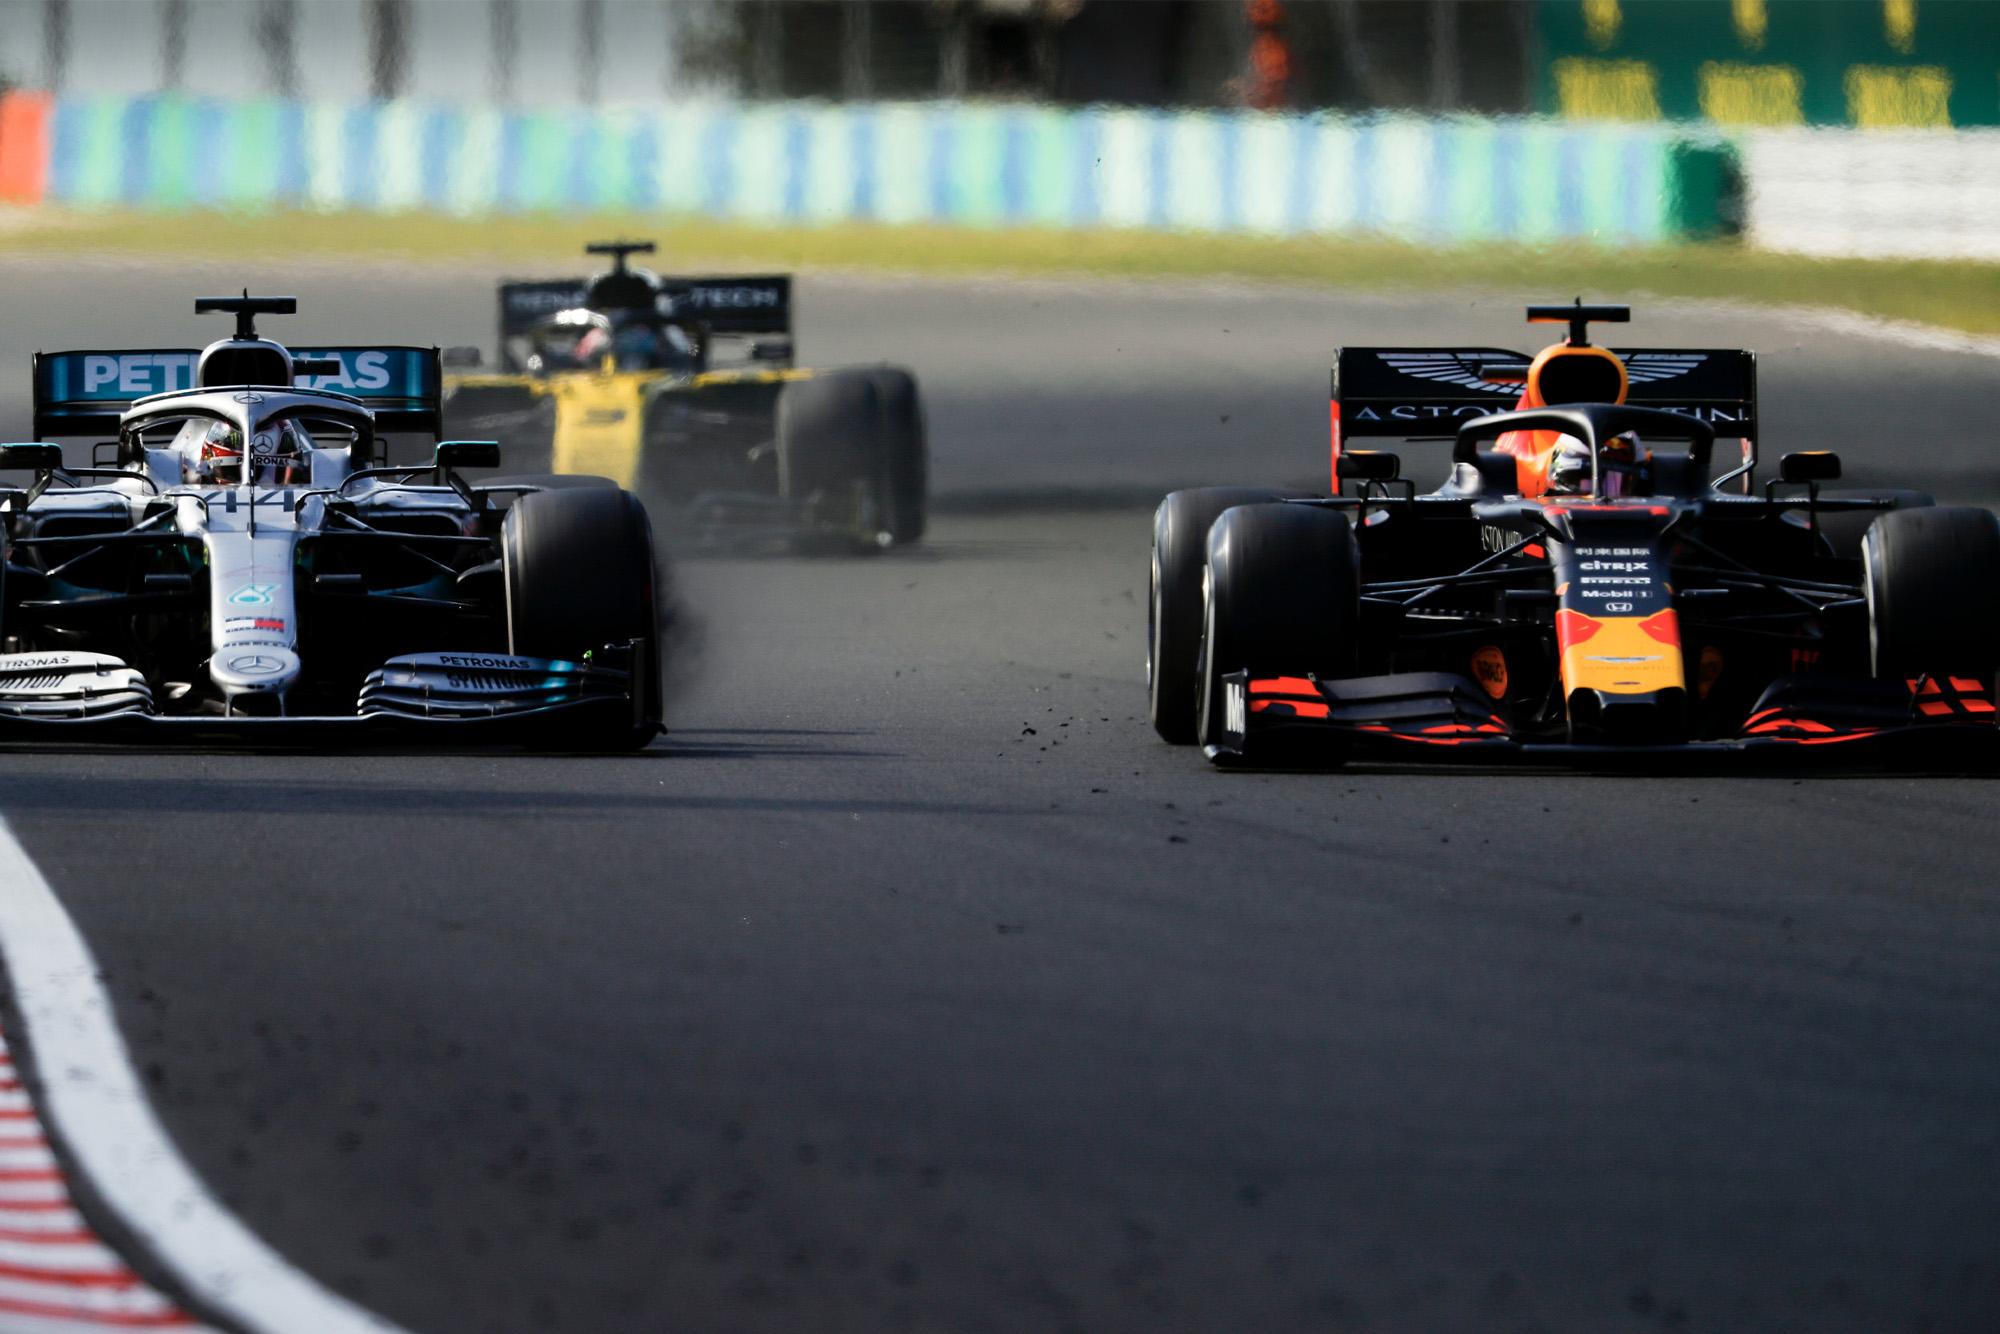 Lewis Hamilton goes wheel-to-wheel with Max Verstappen